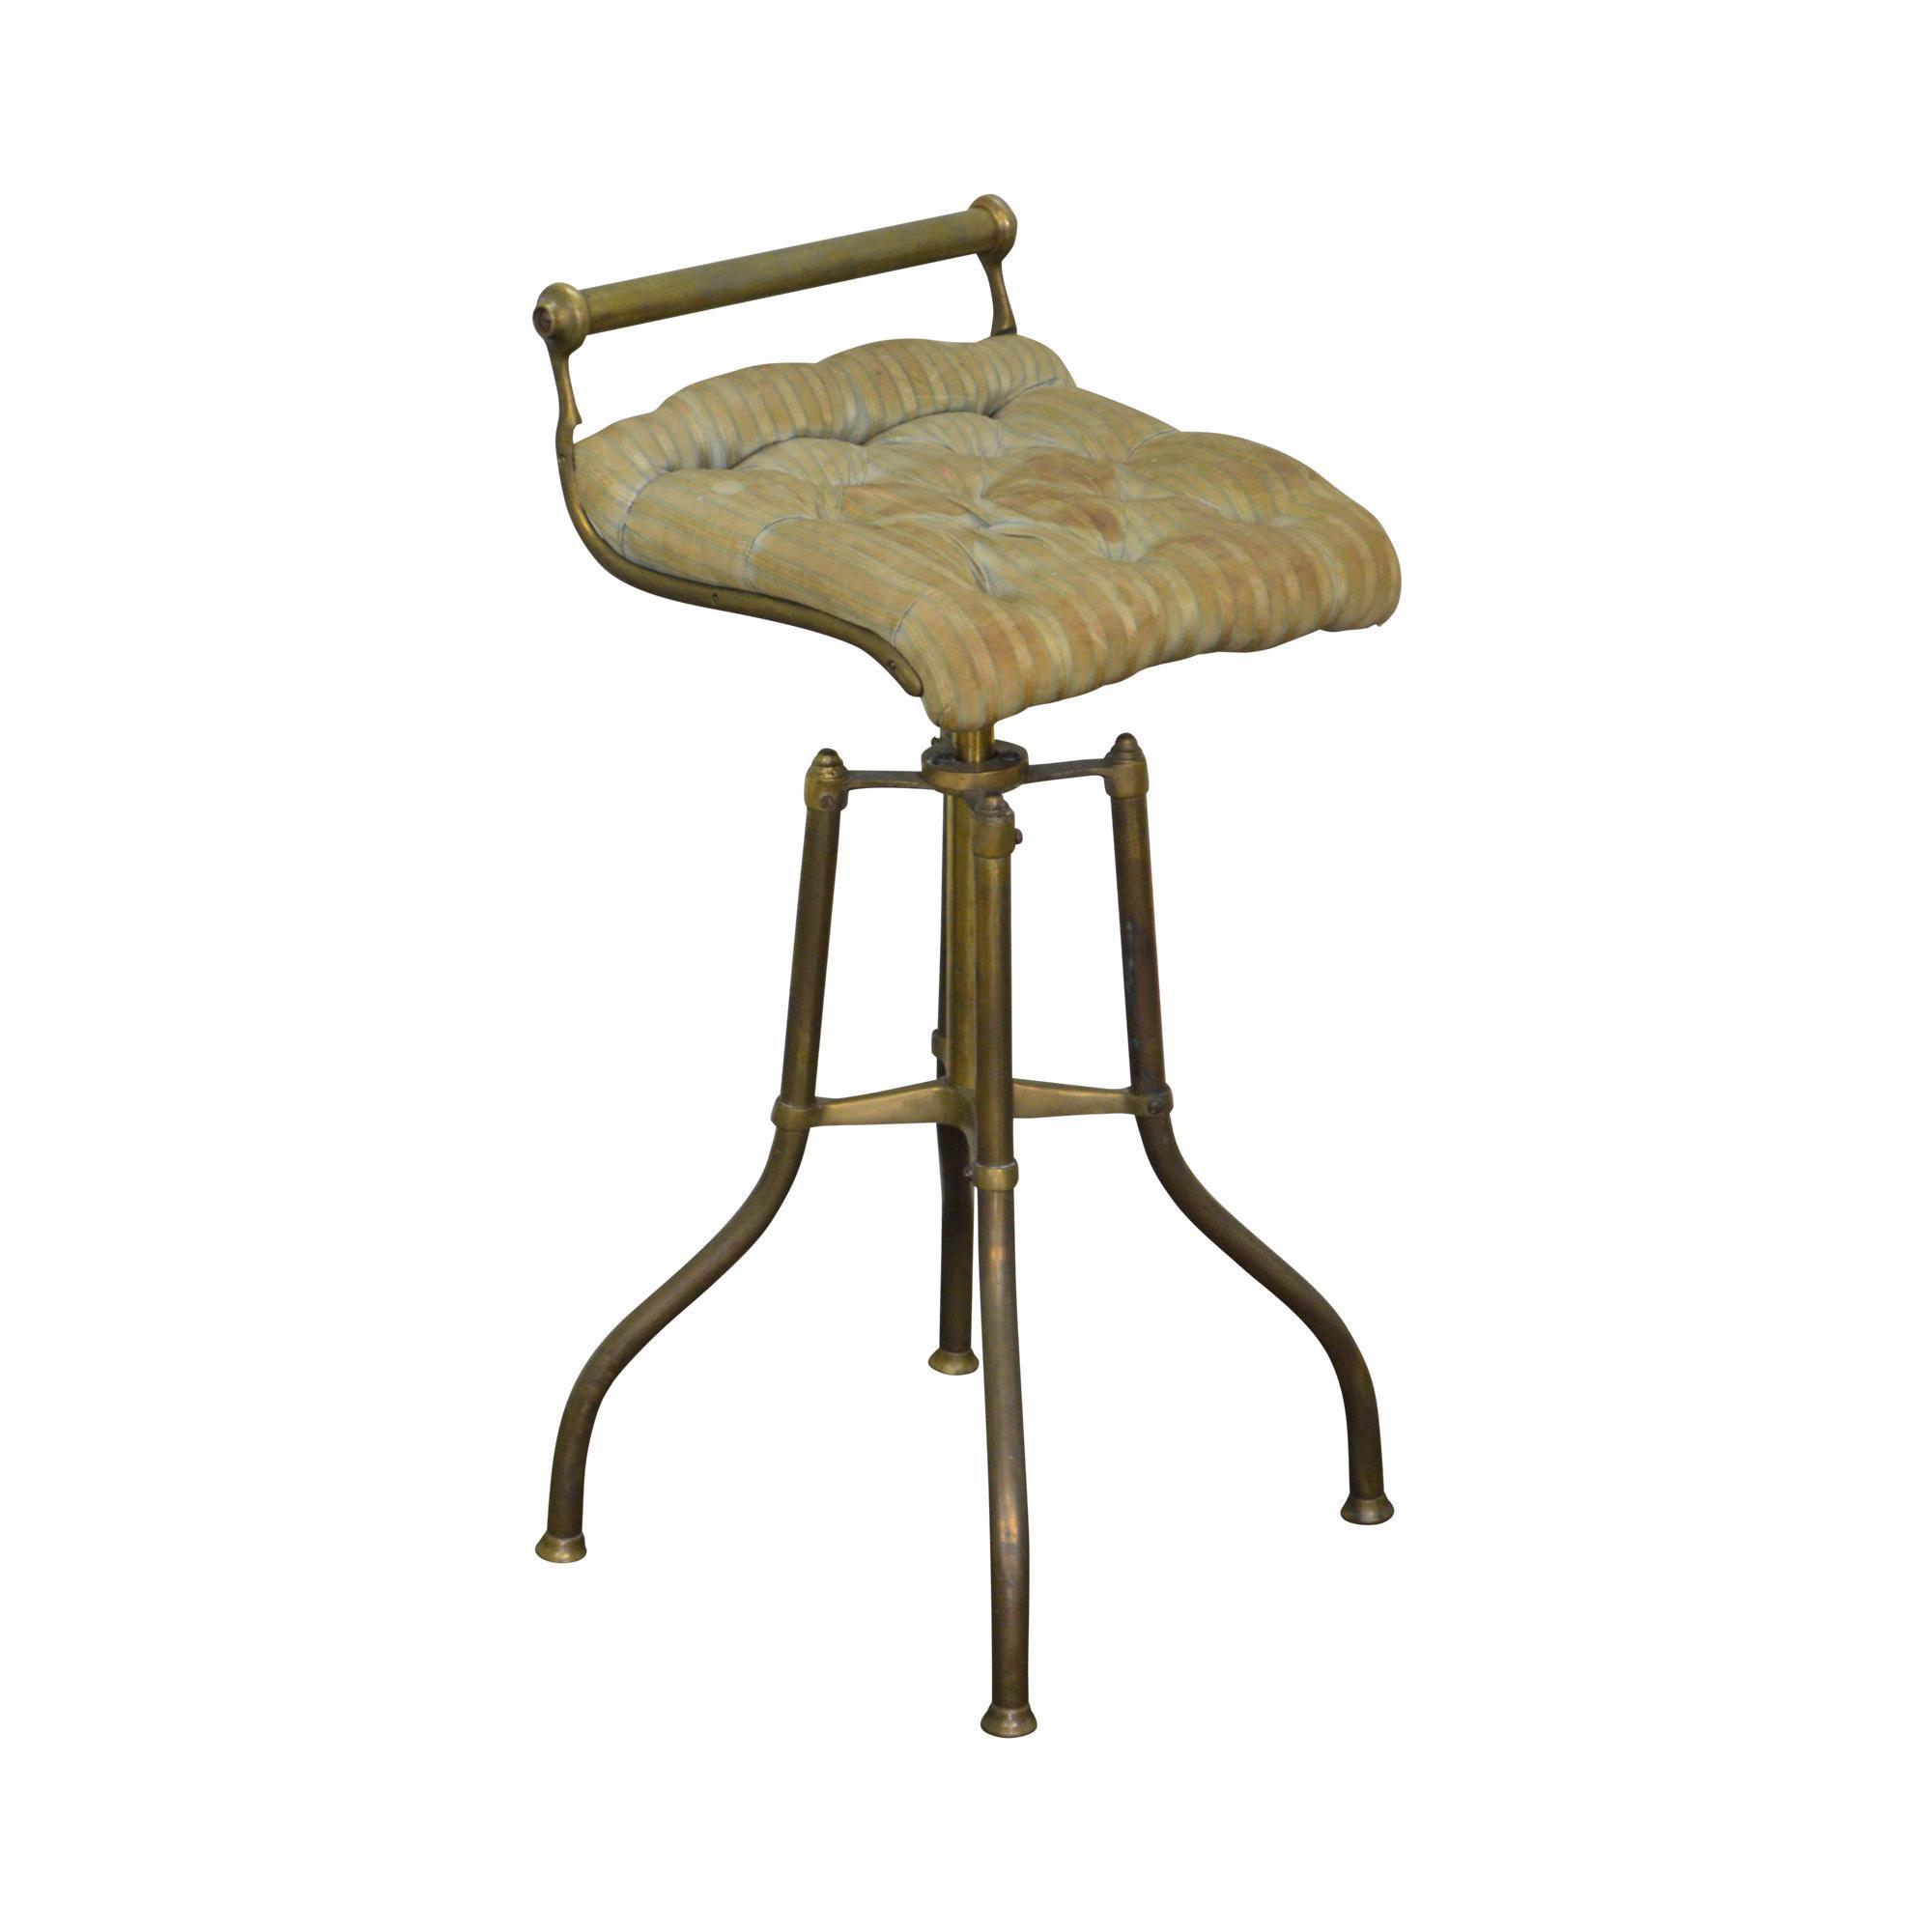 Antique Brass Adjustable Vanity Stool